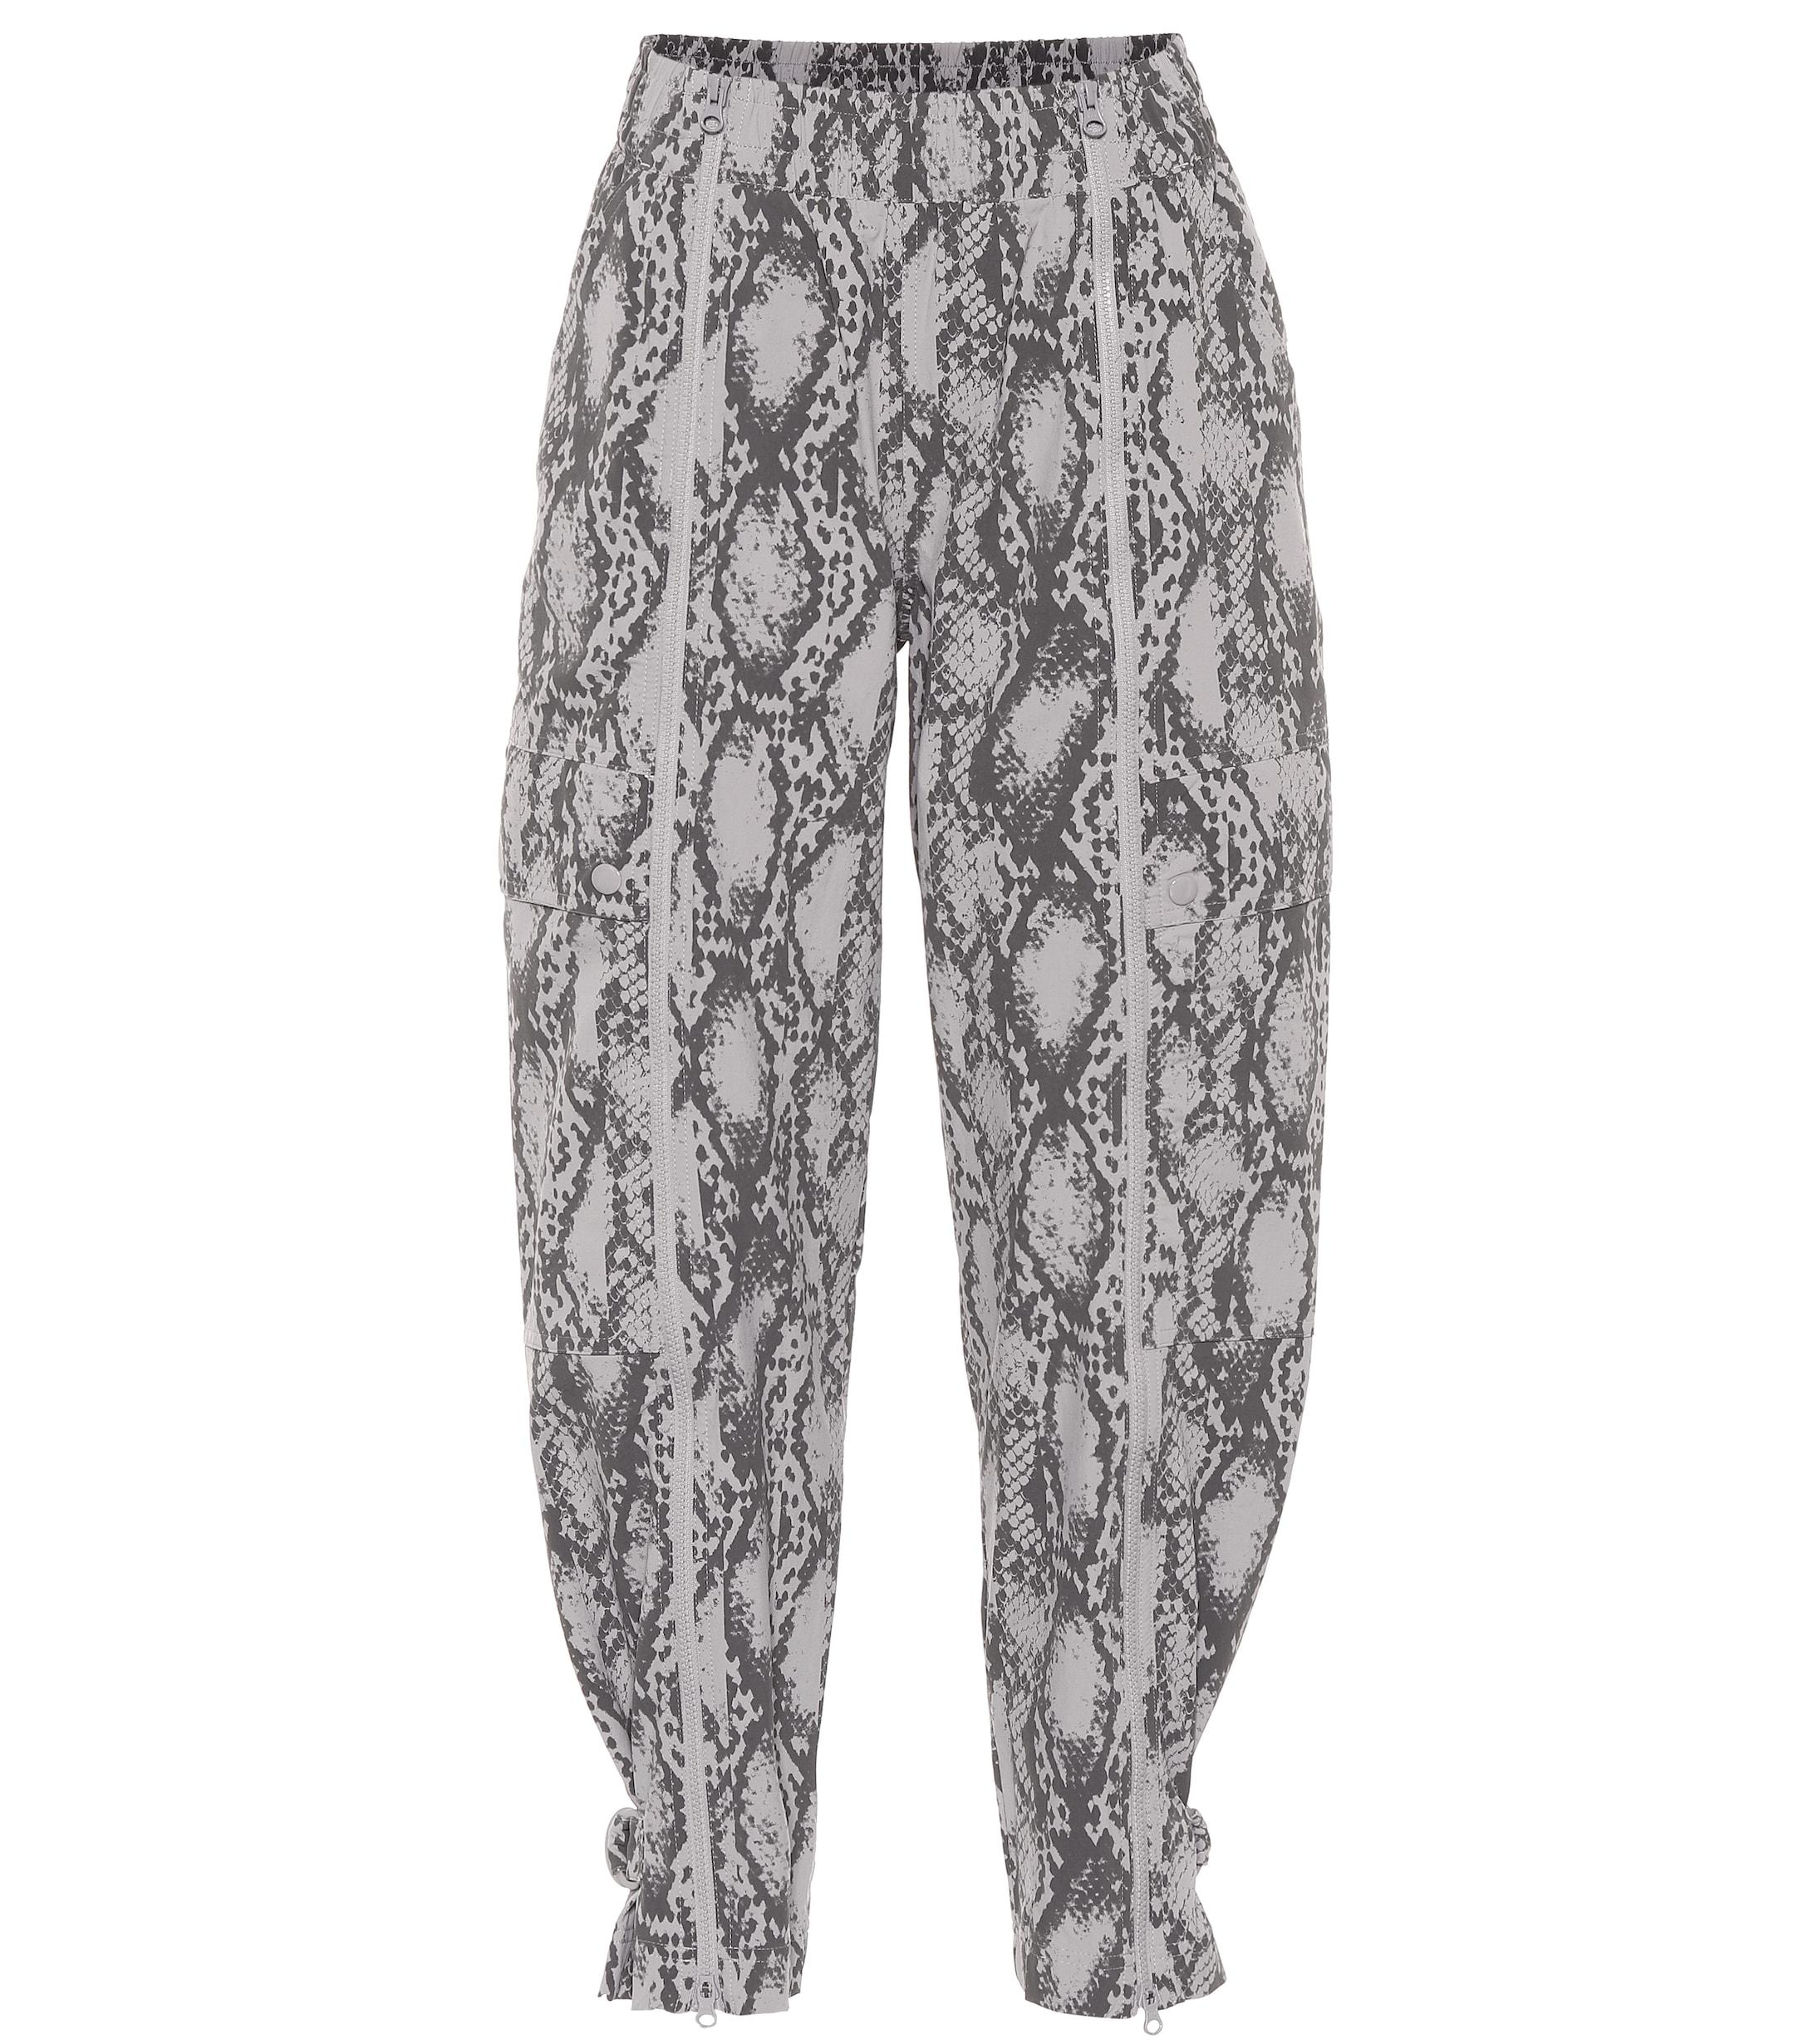 Lyst - Pantalones de chándal Performance adidas By Stella McCartney ... 33ce9acd2d9